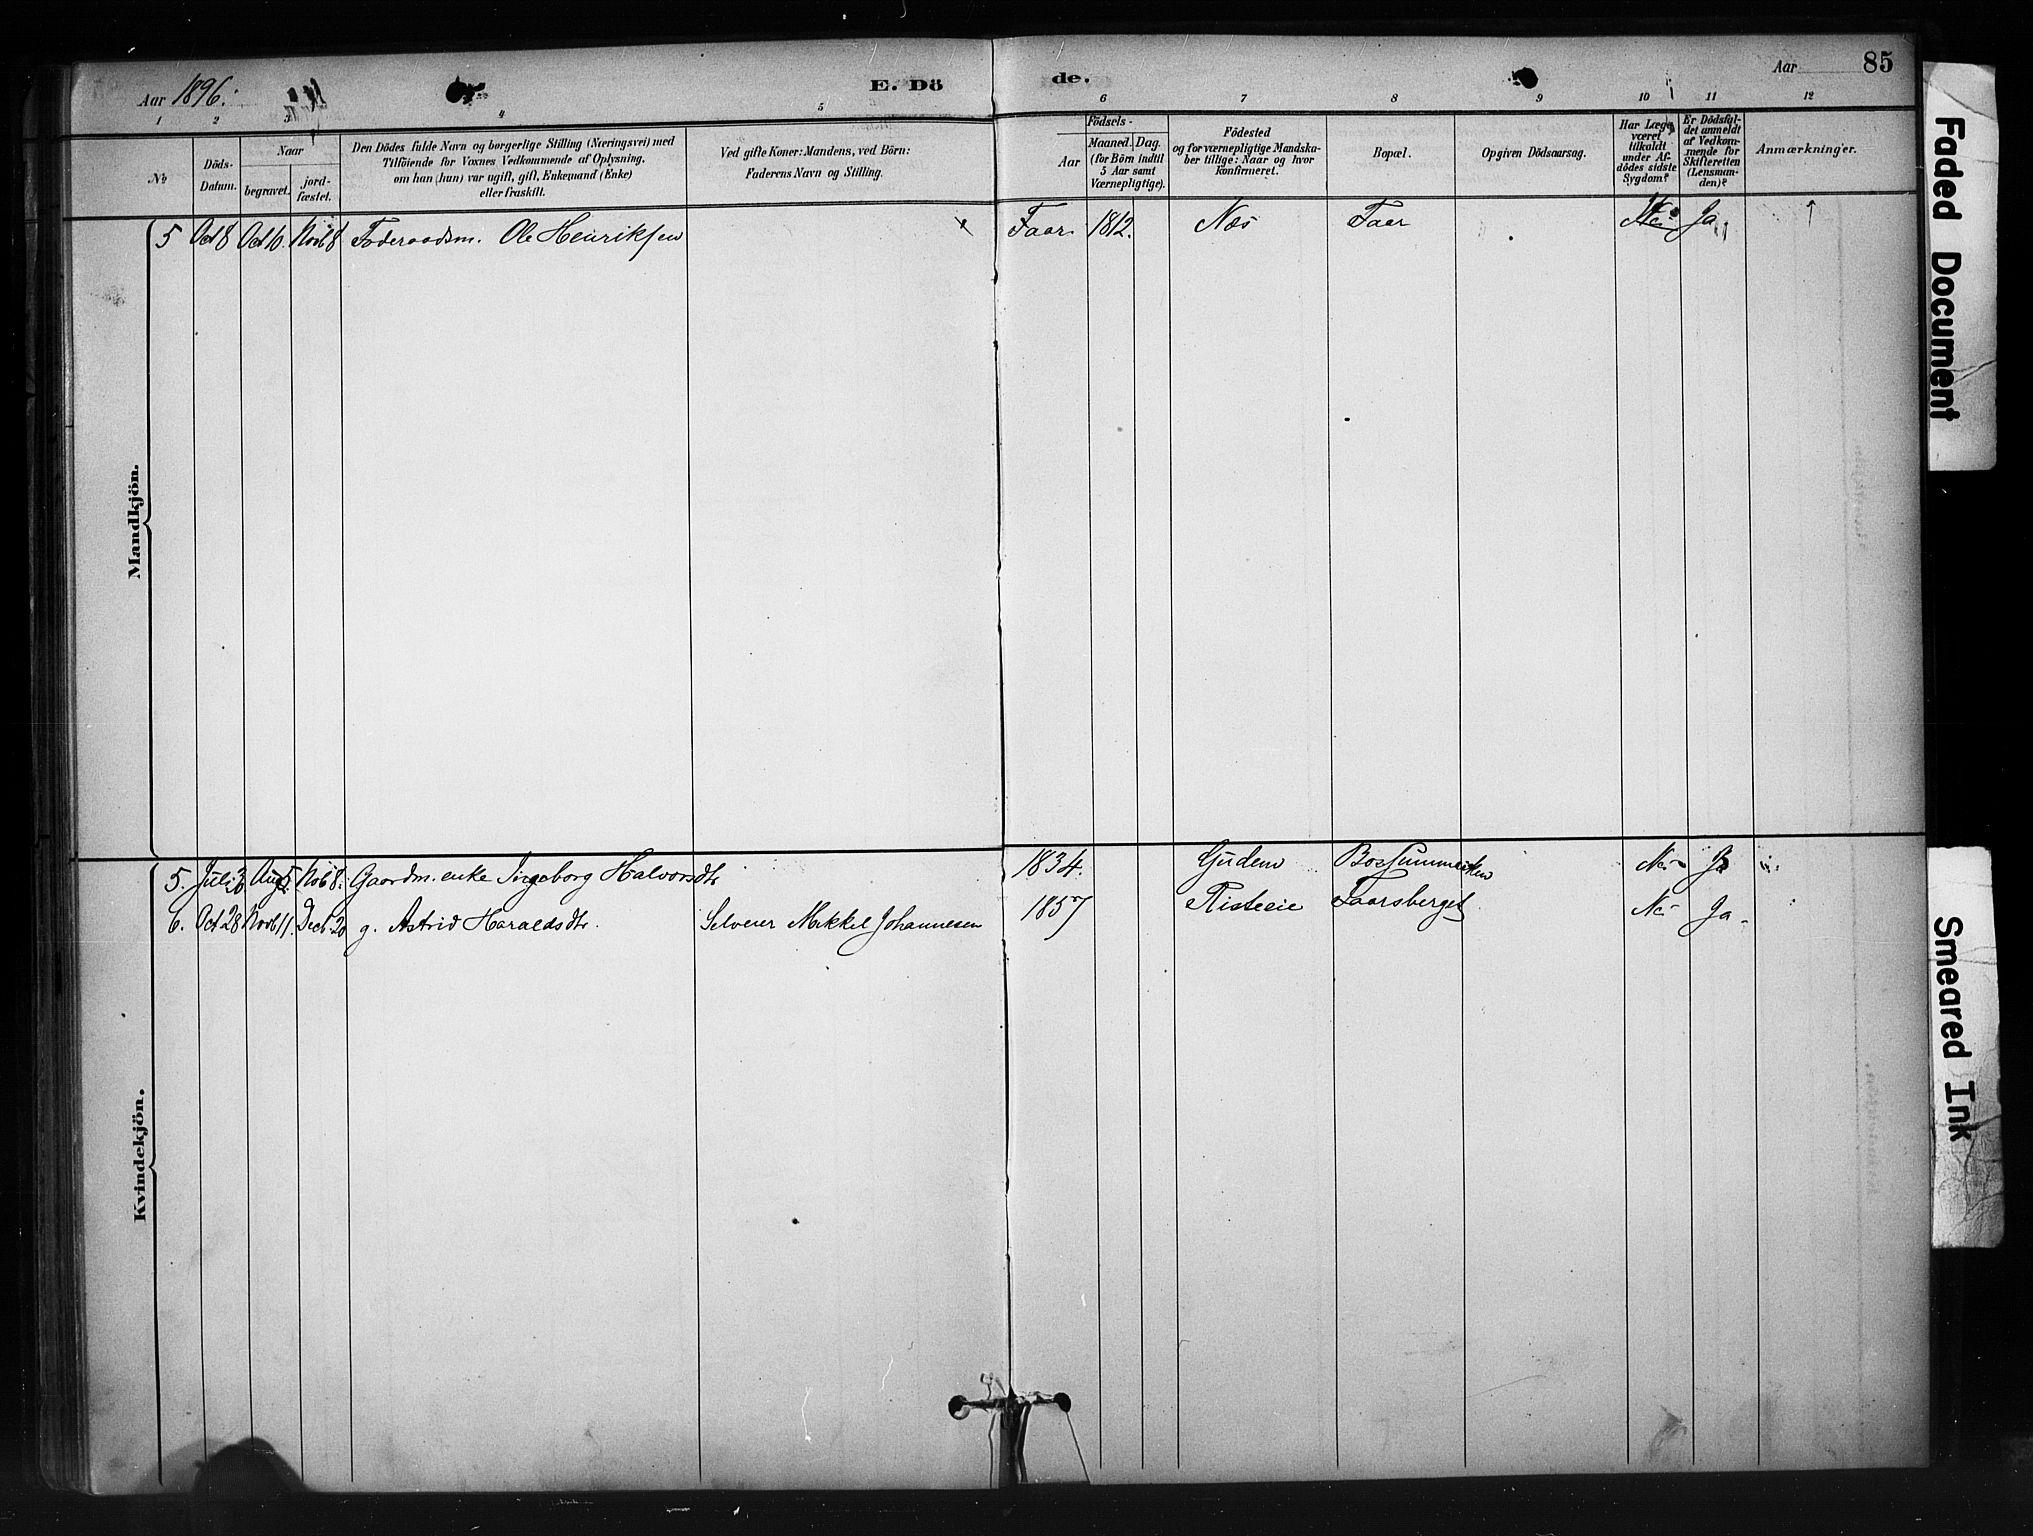 SAH, Nord-Aurdal prestekontor, Ministerialbok nr. 10, 1883-1896, s. 85